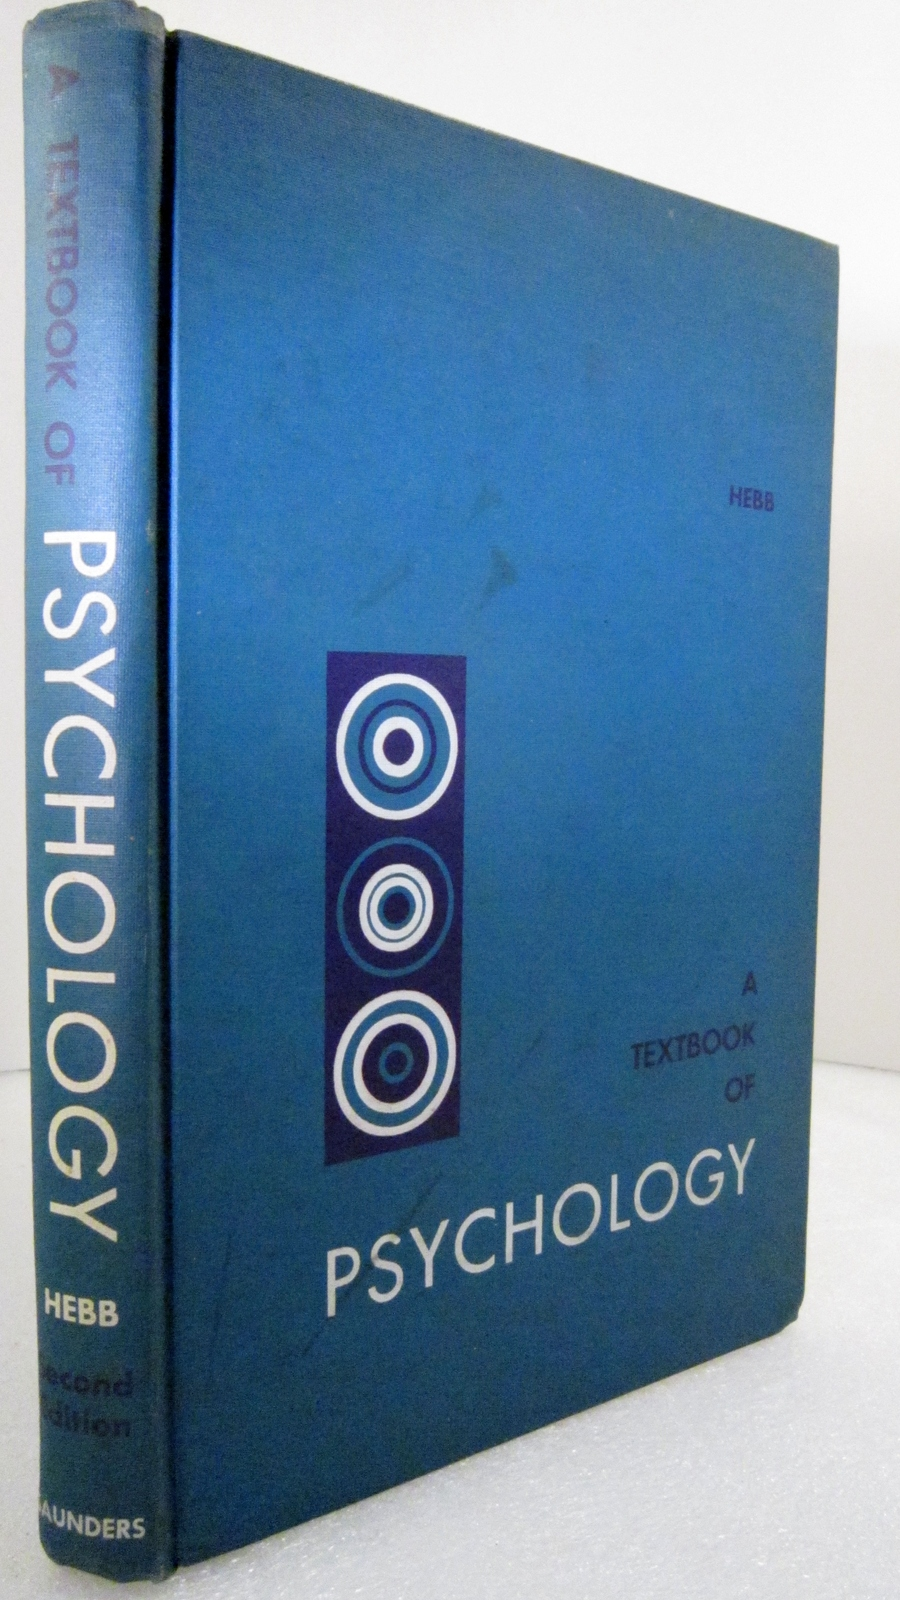 essay on mind donald hebb Donald hebb sa i forbindelse med lashleys 60-års jubileum at dennes nevrobiologisk orienterte eksperimentelle utforskning av psykologiske  hebb d o essay on mind.